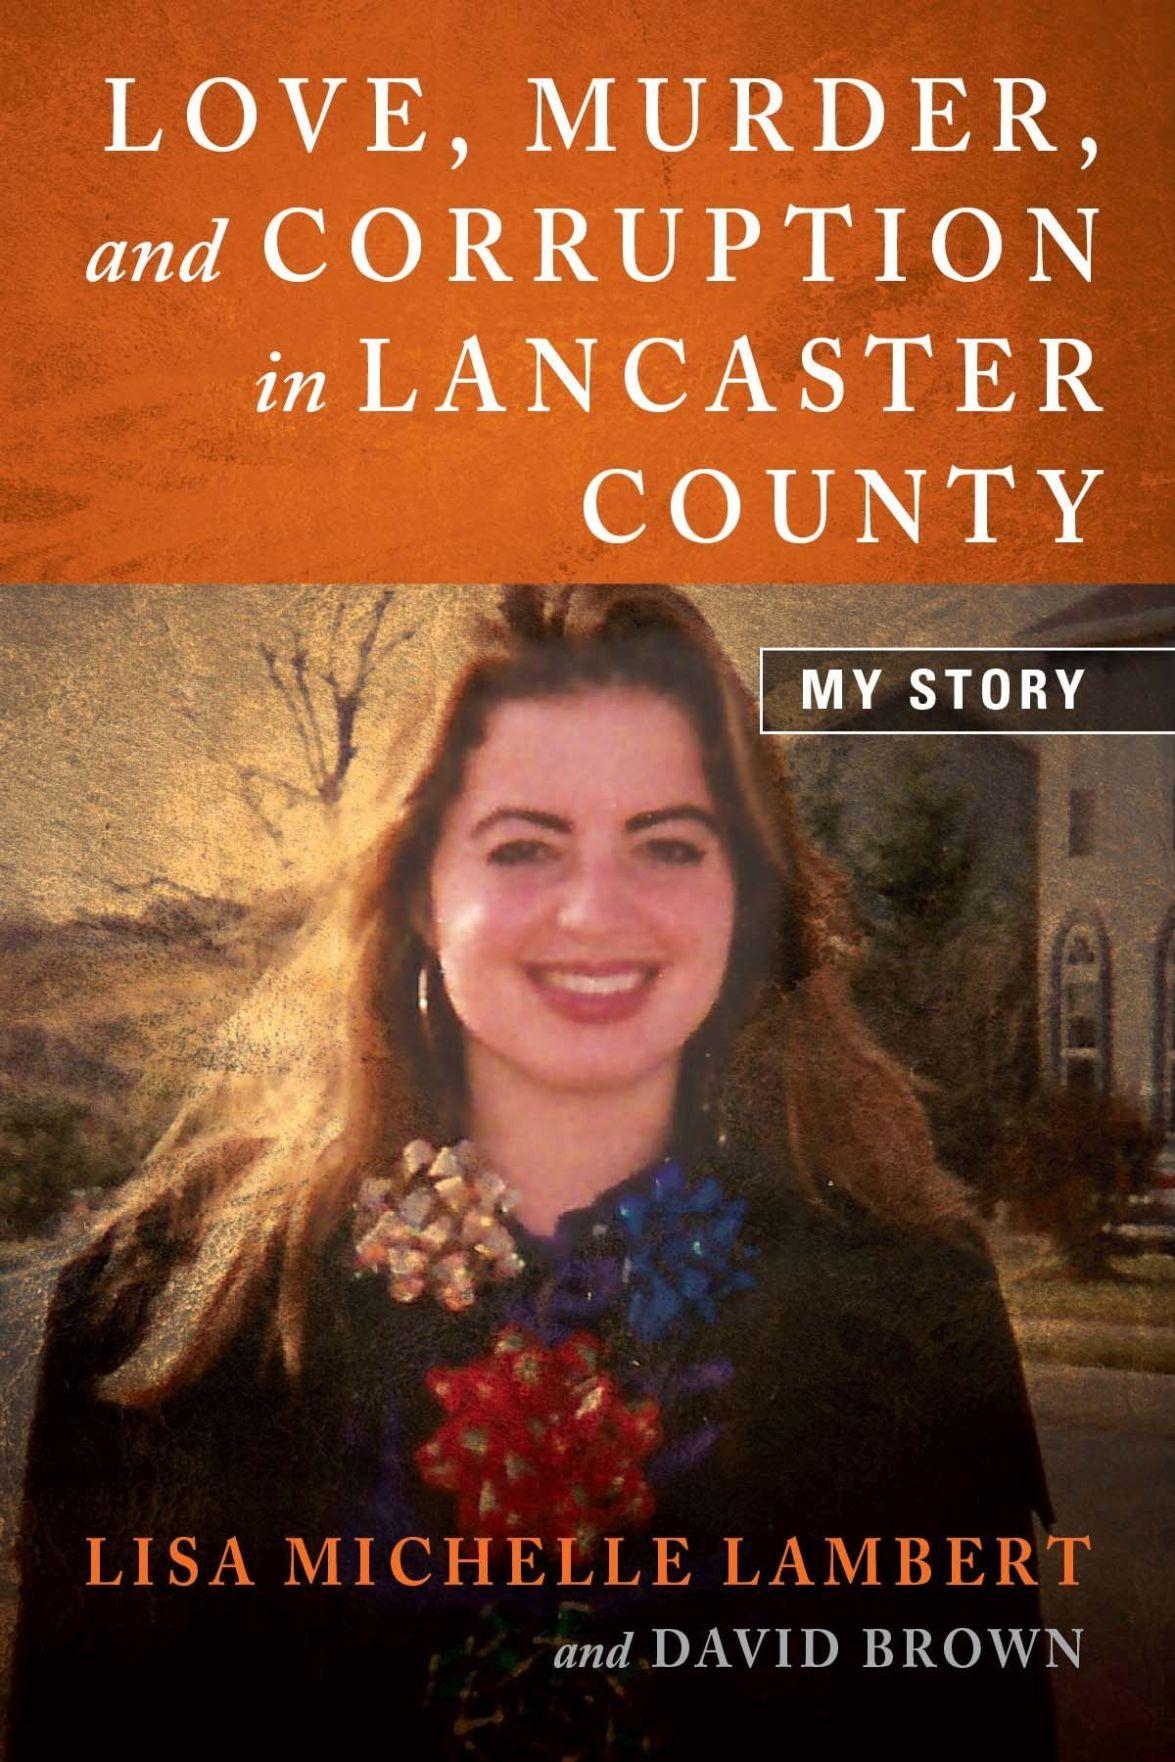 in a killer s words lisa michelle lambert nearly 25